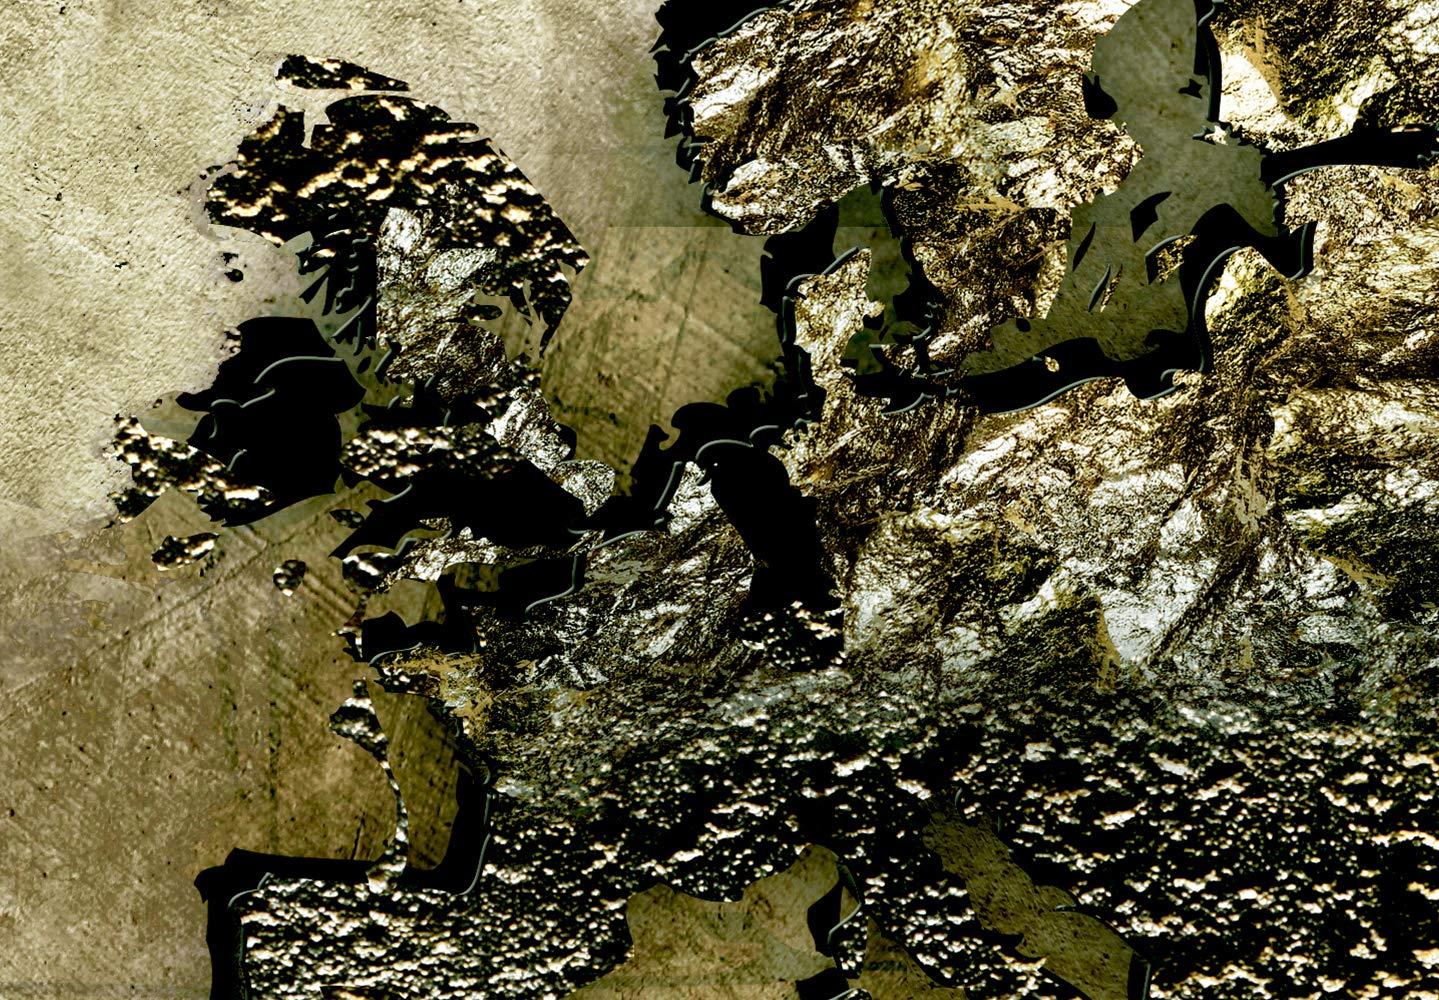 Murando - Fototapete 400x280 cm cm cm - Vlies Tapete - Moderne Wanddeko - Design Tapete - Wandtapete - Wand Dekoration - Weltkarte k-A-0002-a-b 82d01a